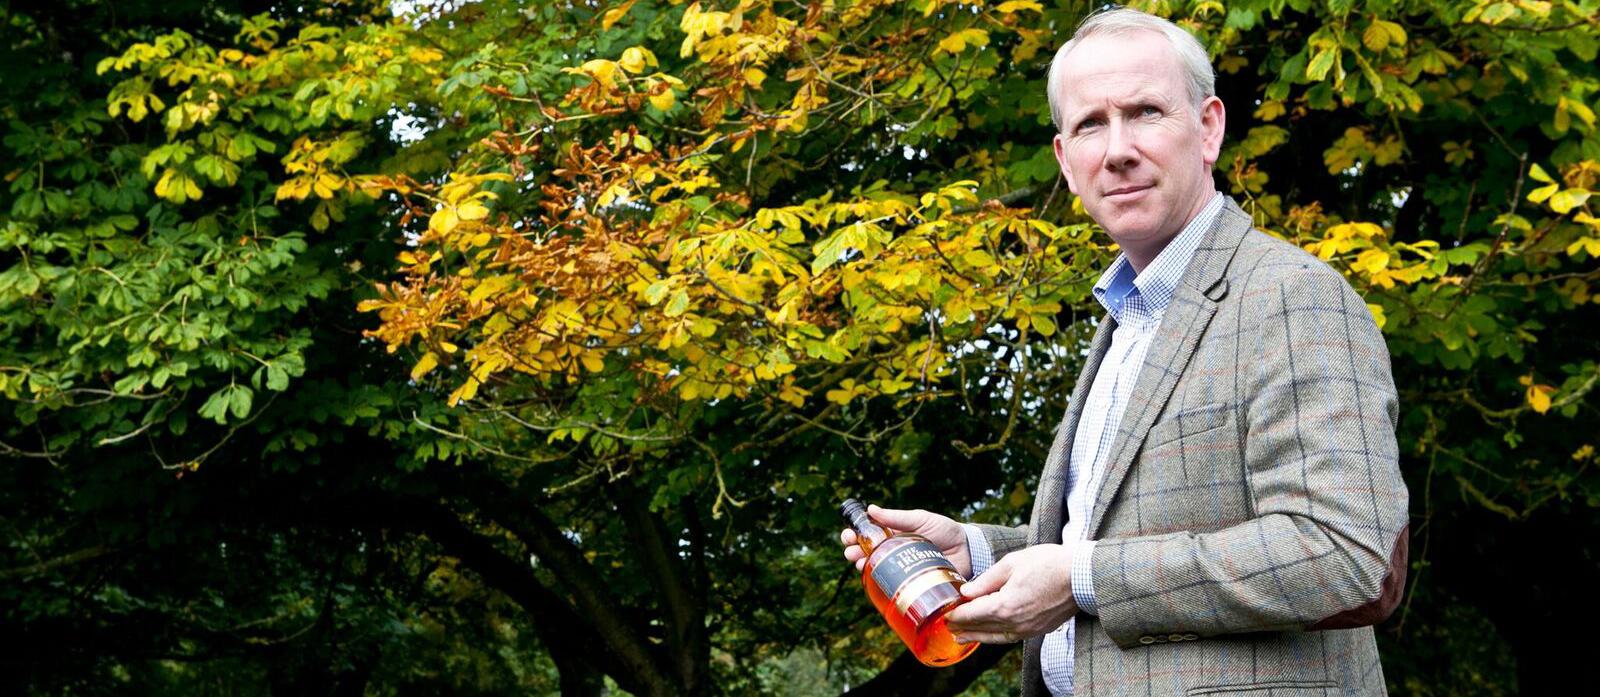 Bernard-walsh-The-Irishman-Netflix-Whiskey-Irlandais Whisky du monde